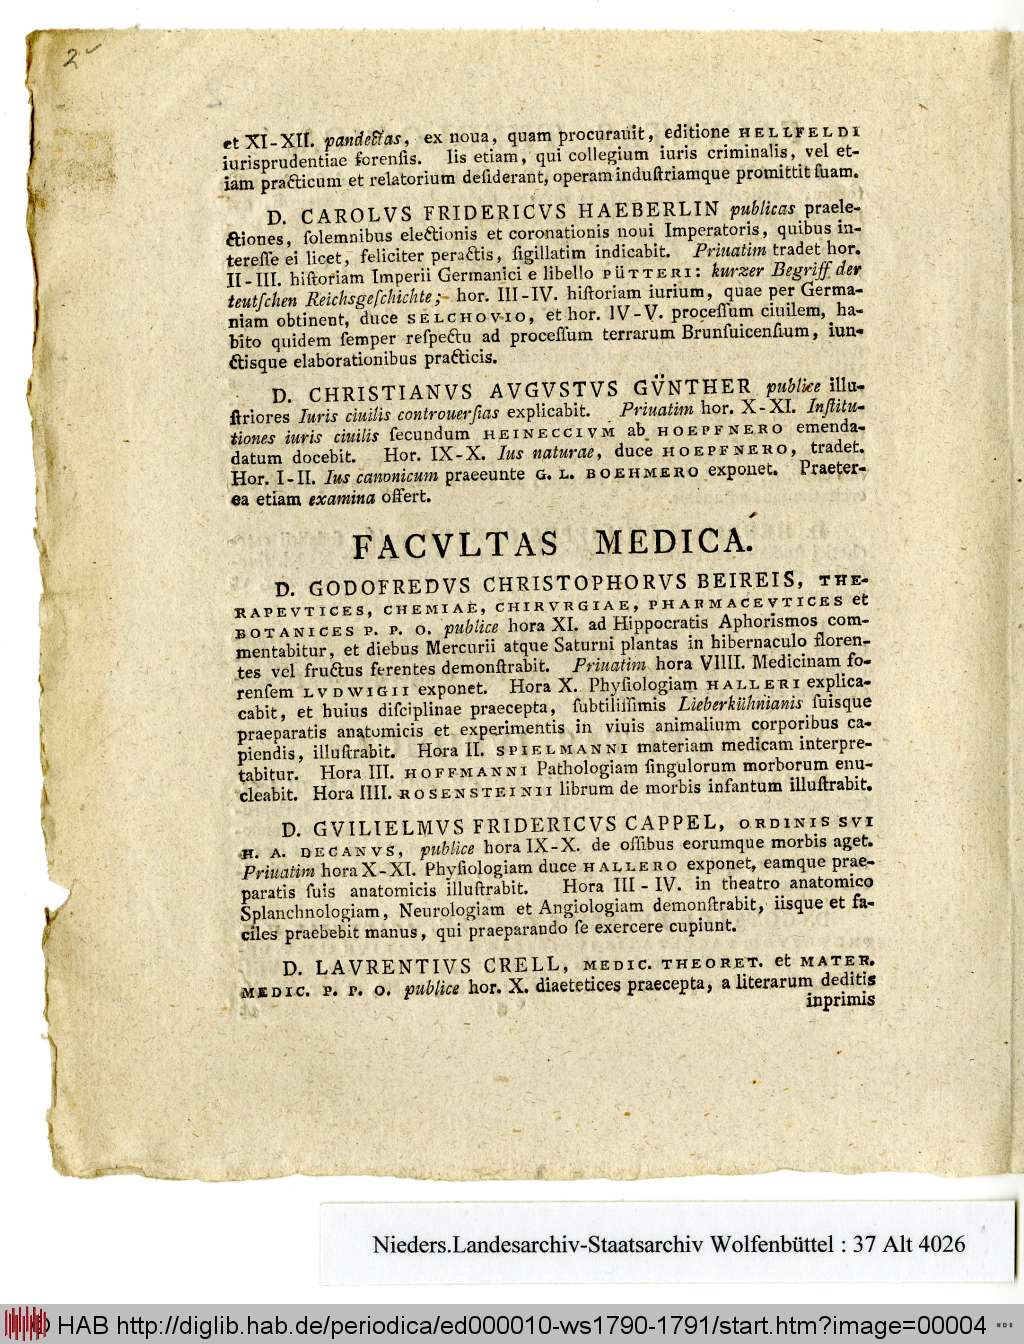 http://diglib.hab.de/periodica/ed000010-ws1790-1791/00004.jpg